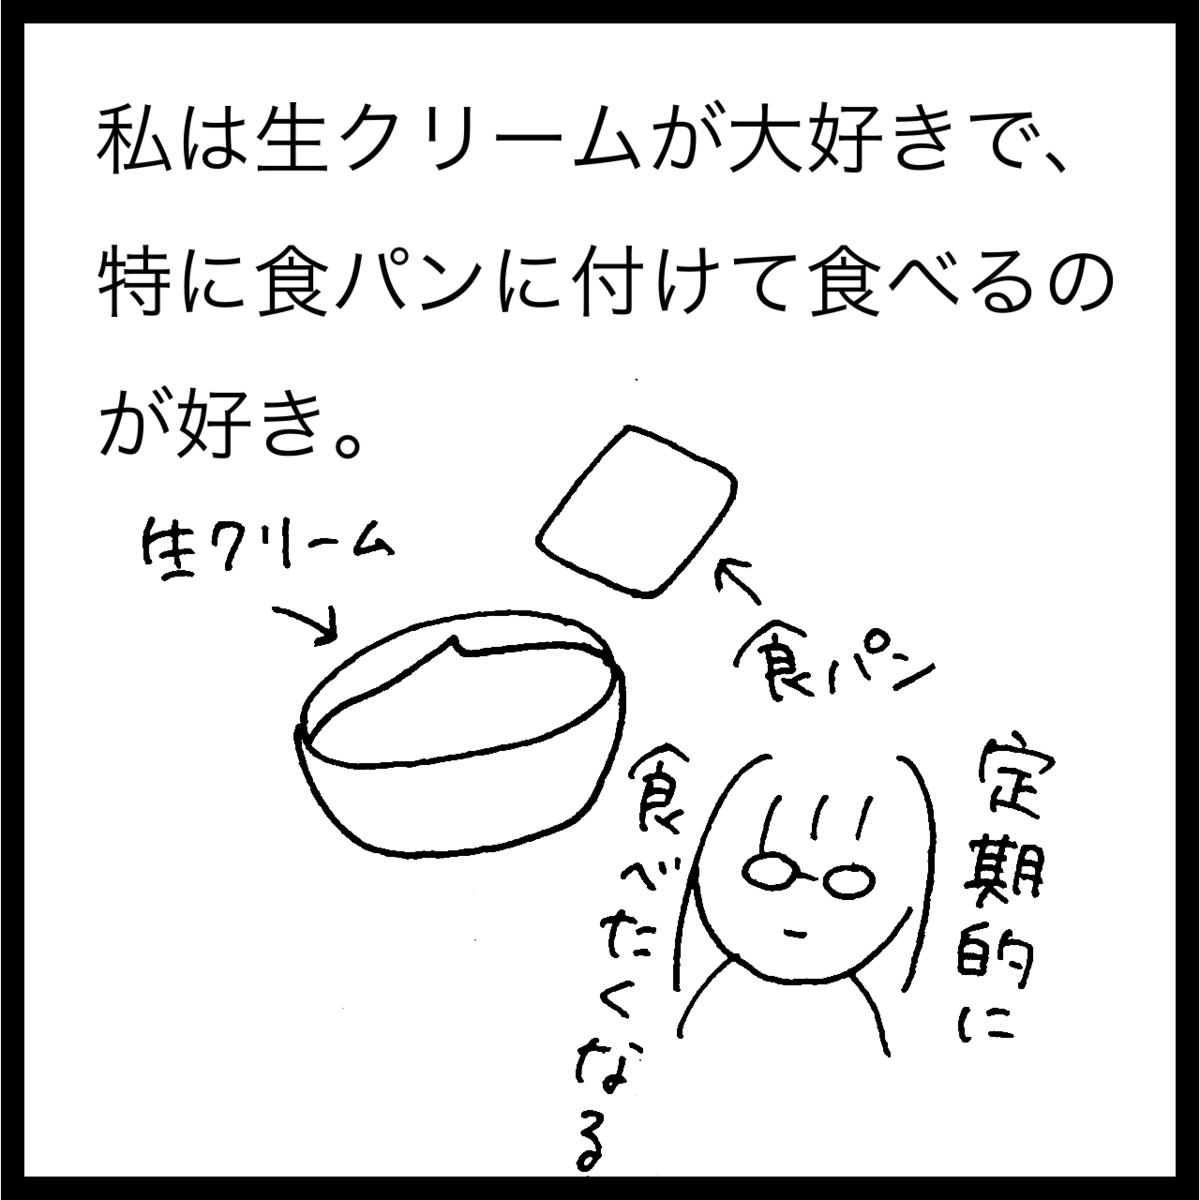 f:id:komyusyomama:20210917132755p:plain